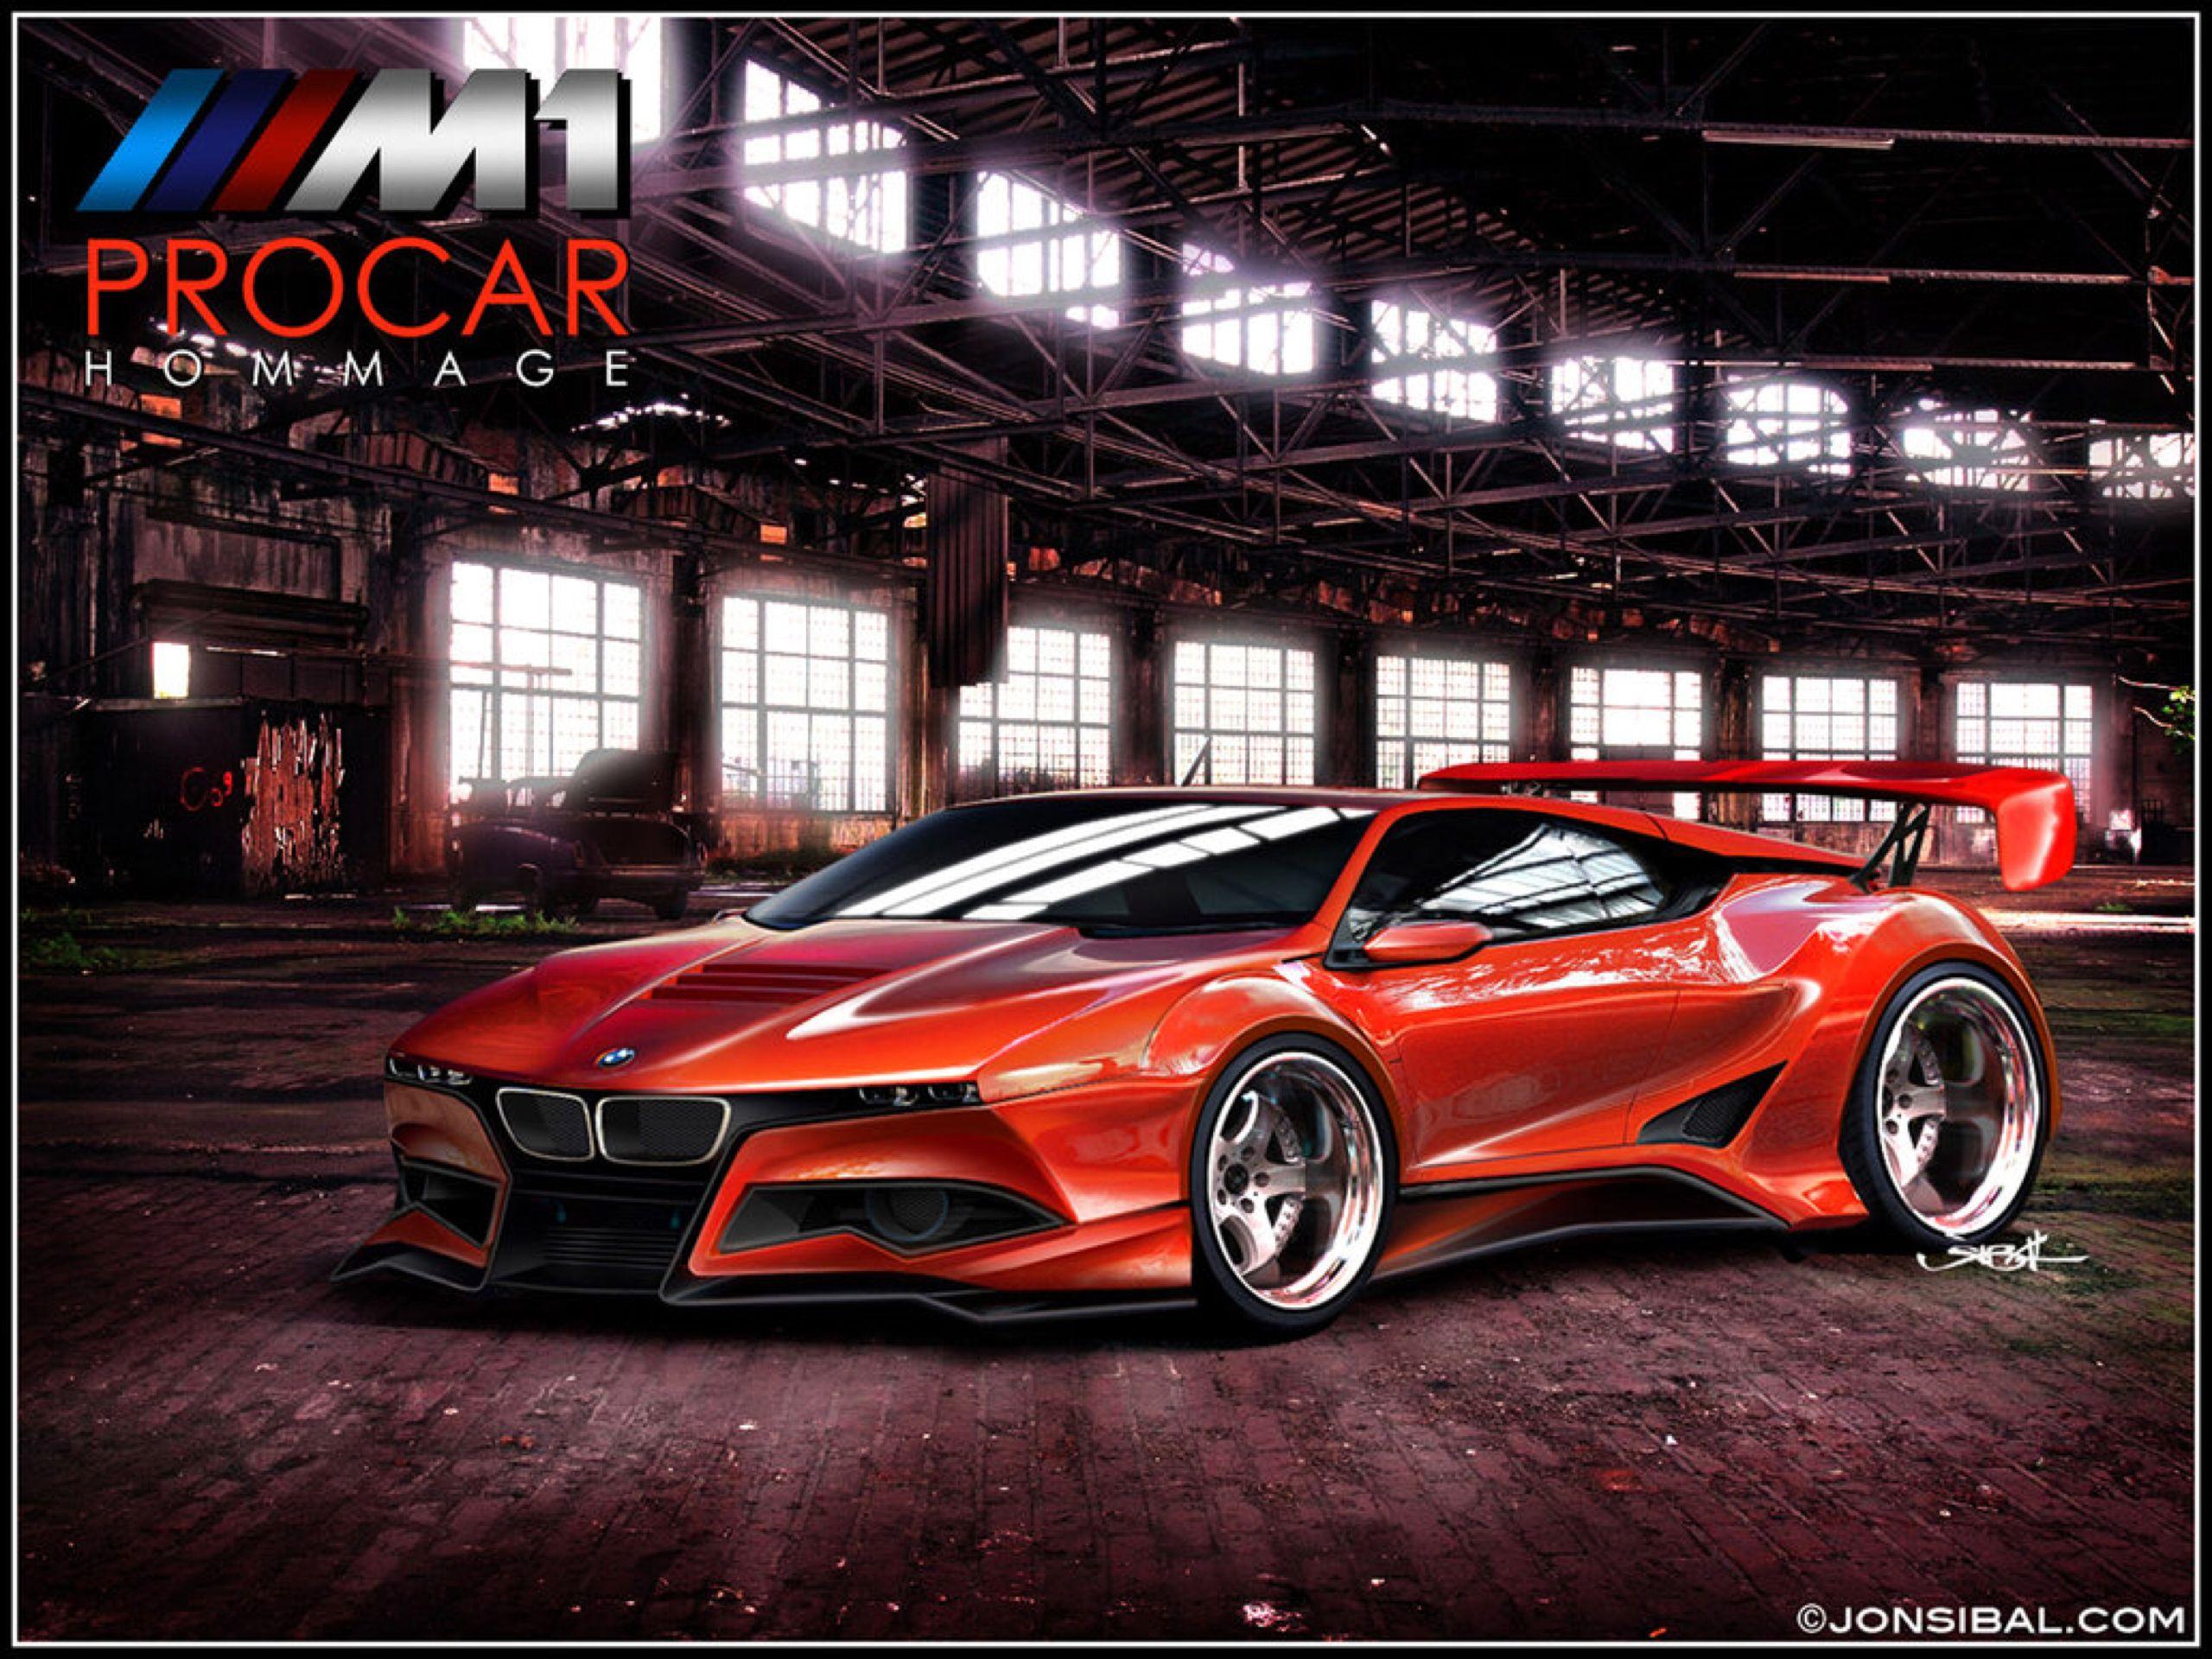 67ed101ddfe BMW M1 PROCAR Hommage by jonsibal on @DeviantArt | concept cars ...